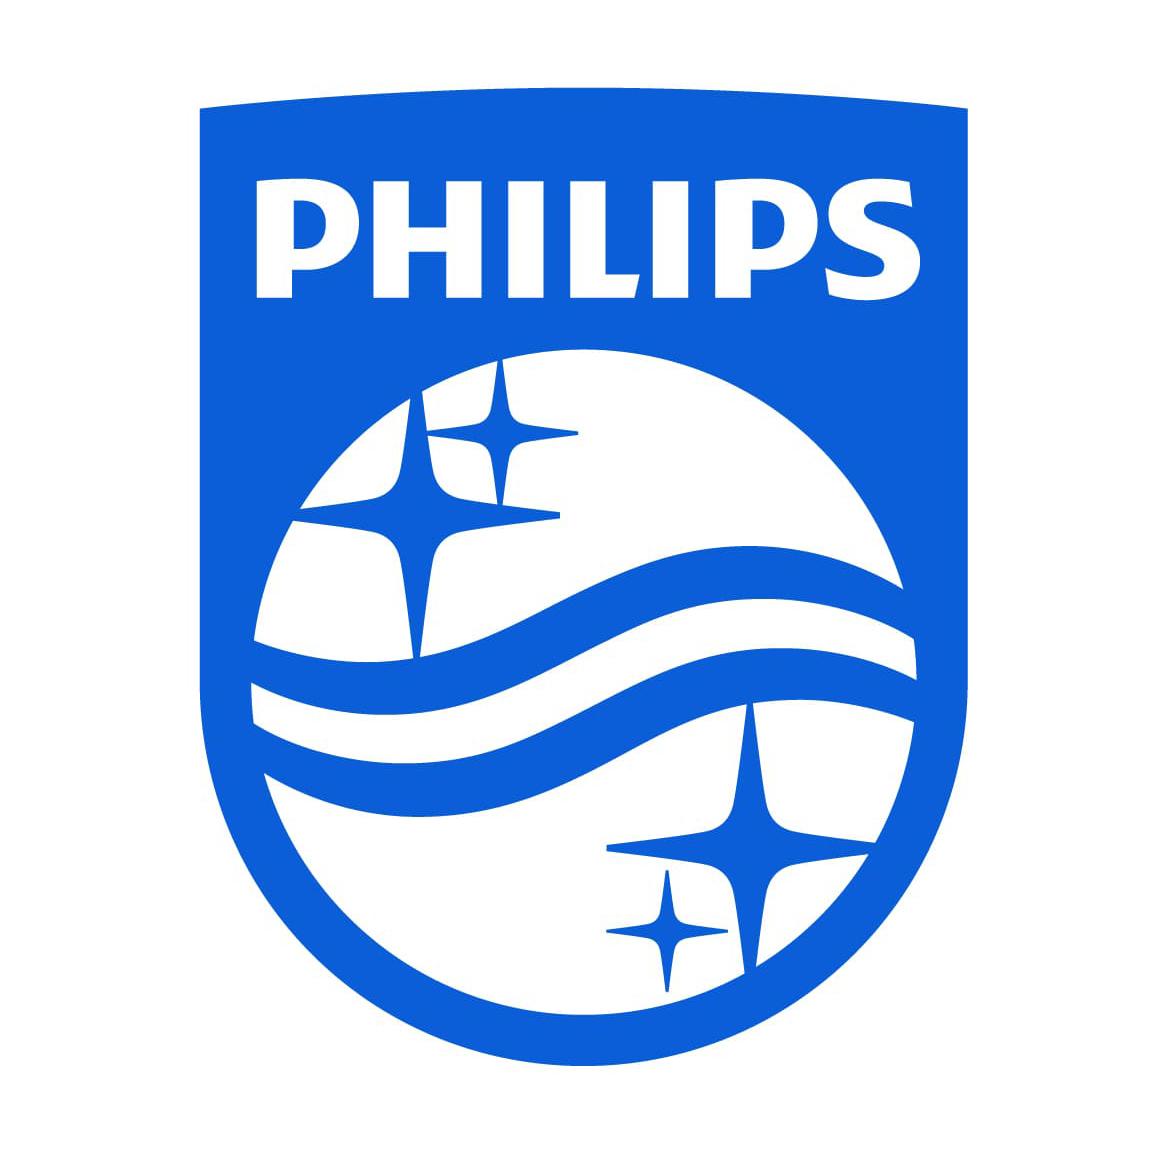 Philips-Shield.jpg